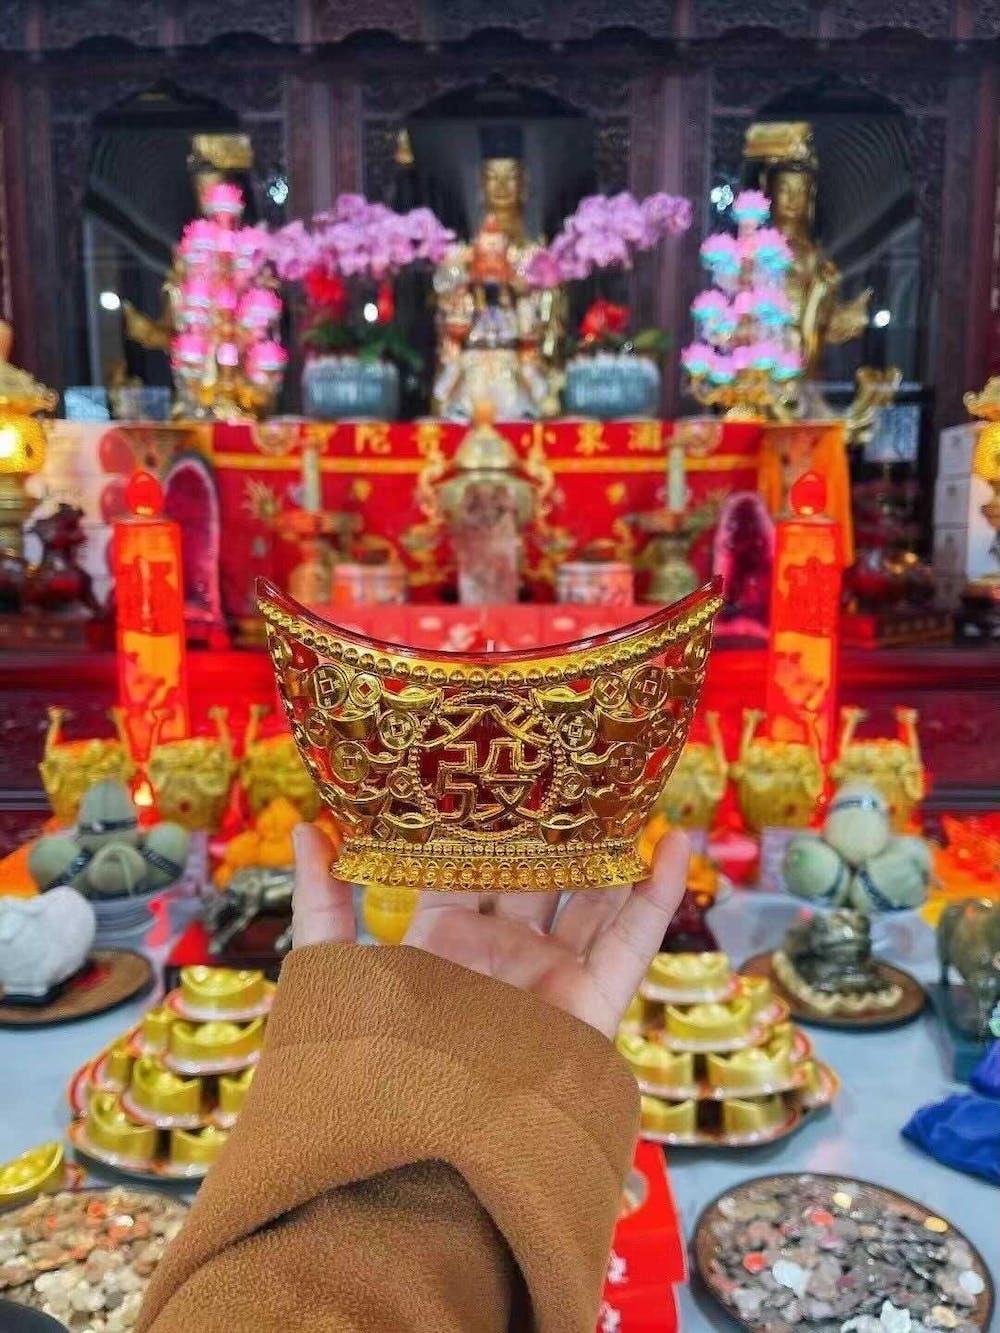 AU students celebrate Lunar New Year through culinary tradition